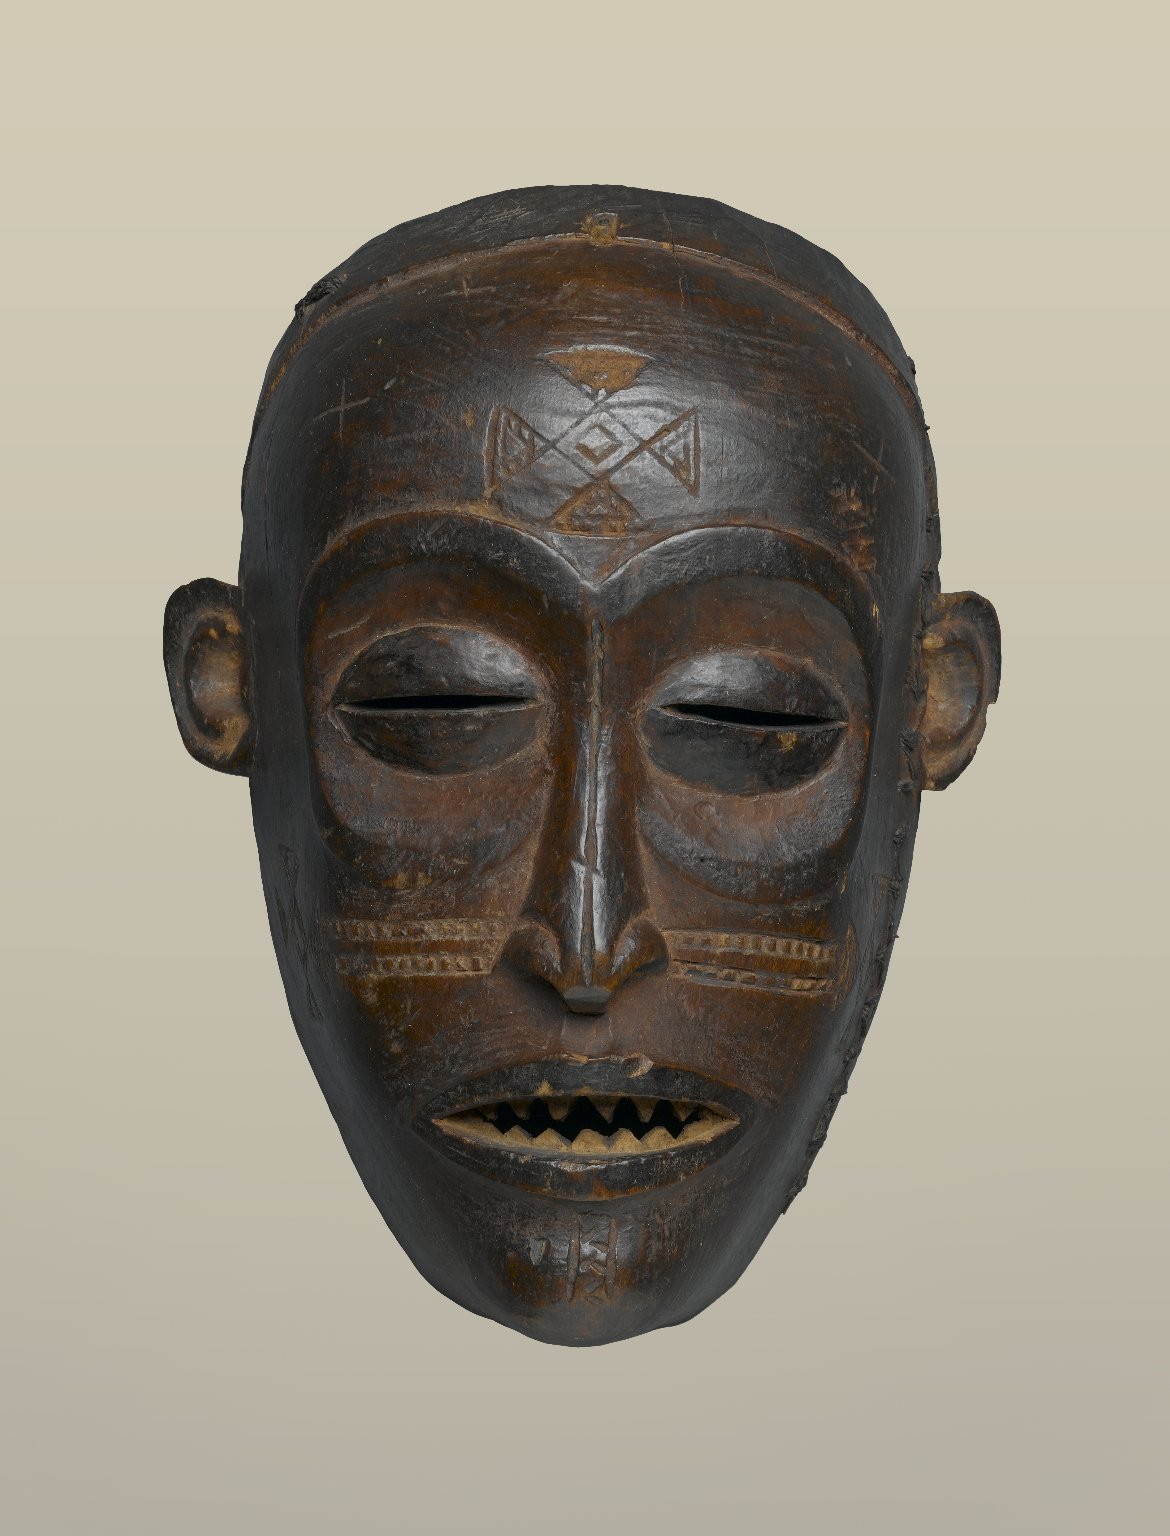 Brooklyn Museum, African American Art, Black Art, African American Art Museum, Black Art Museum, KINDR'D Magazine, KINDR'D, KOLUMN Magazine, KOLUMN